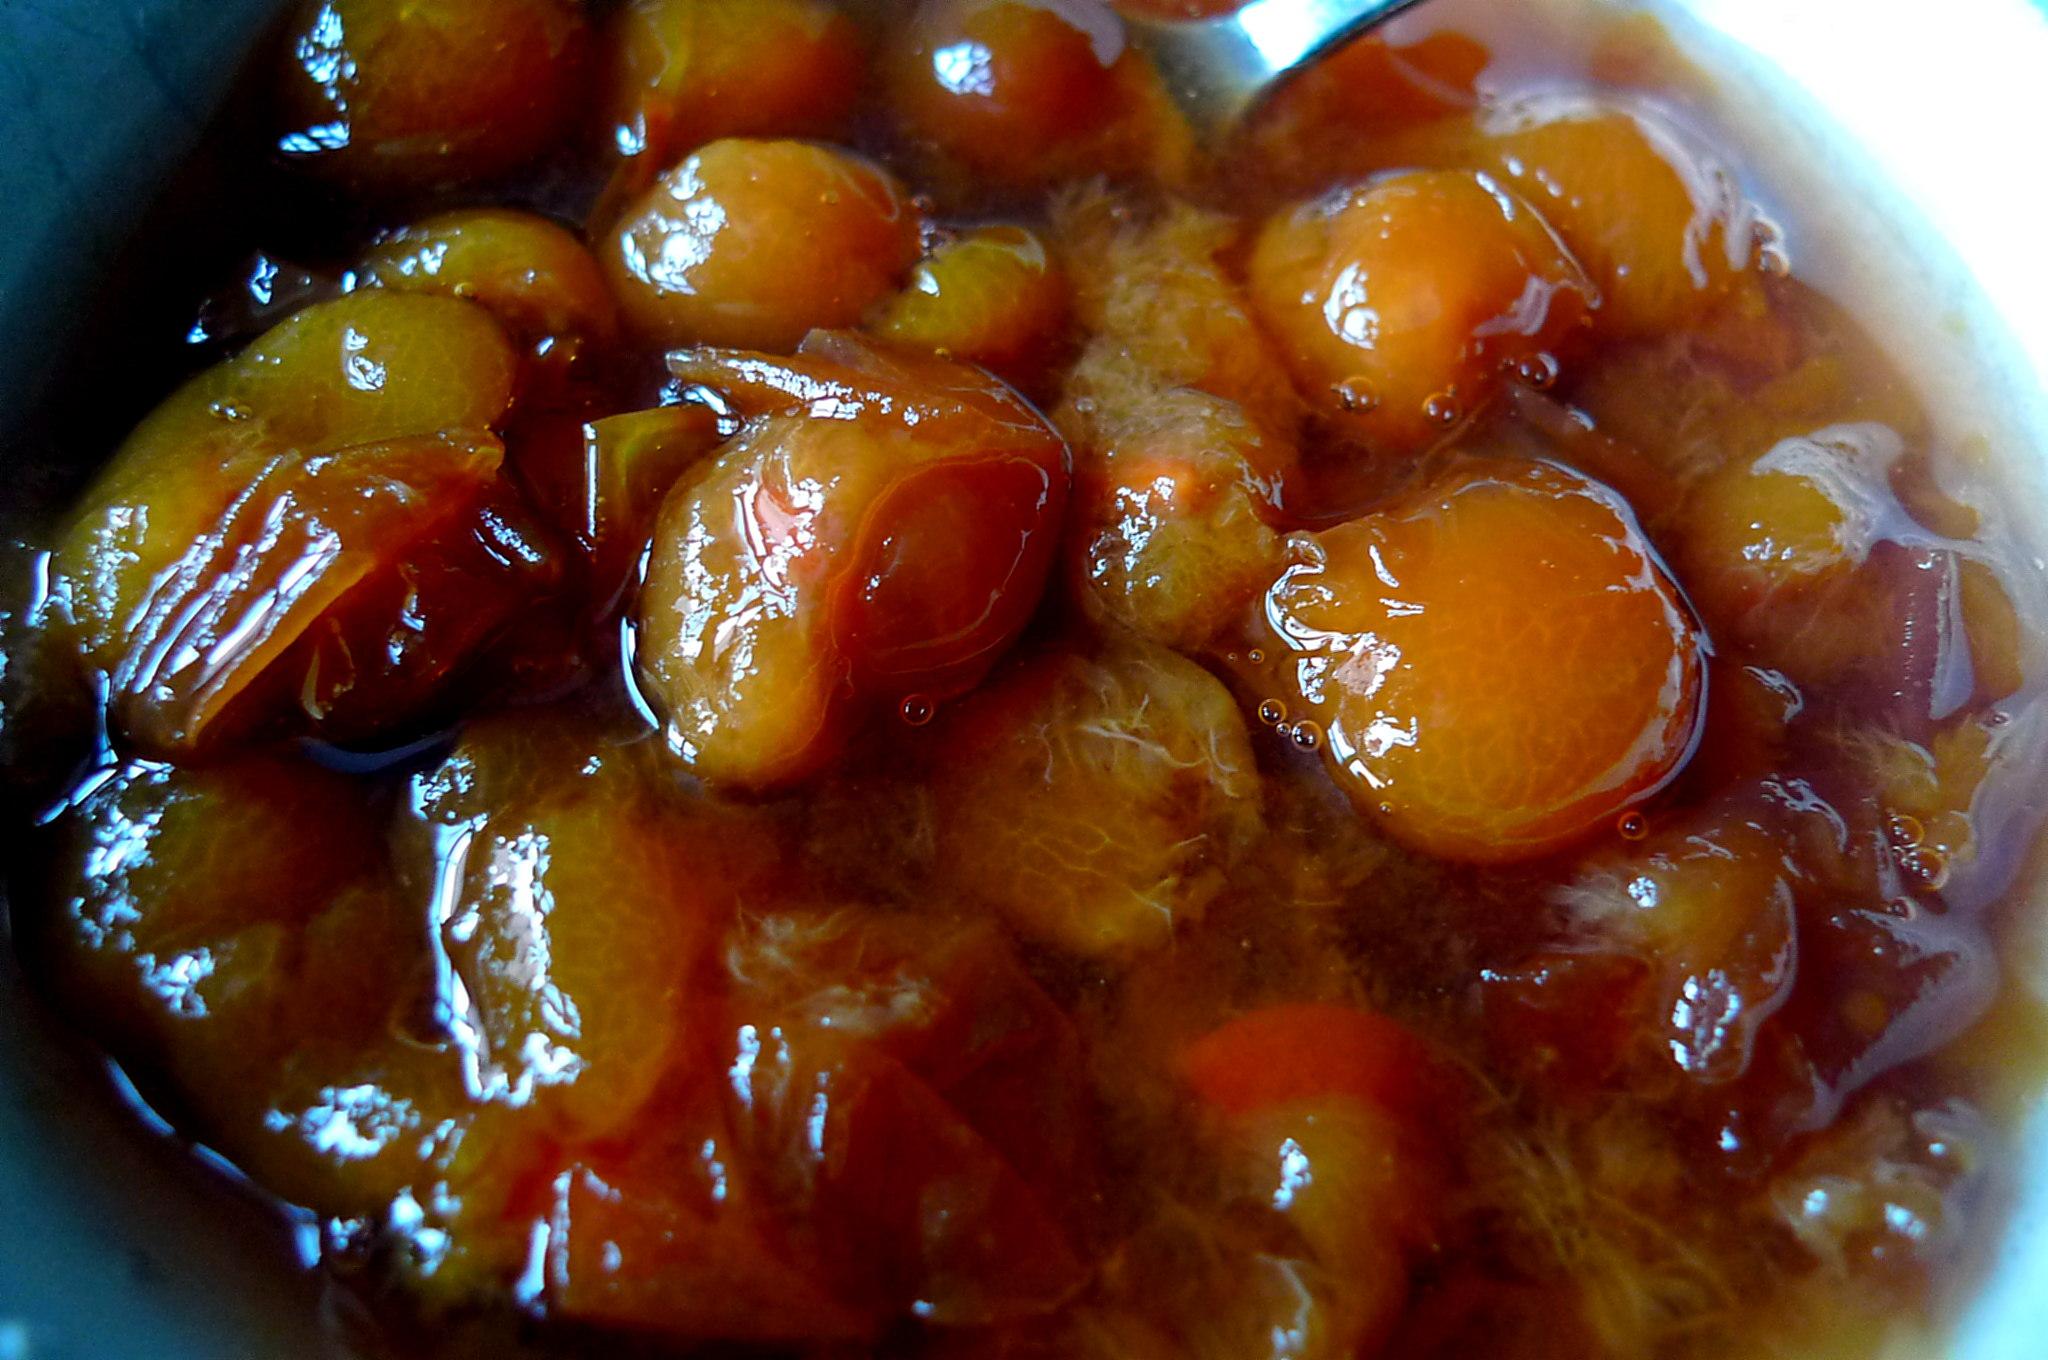 geraucherter-tofuhokkaidopellkartoffelnruhreifeldsalatmirabellenkompottvegetarisch-13